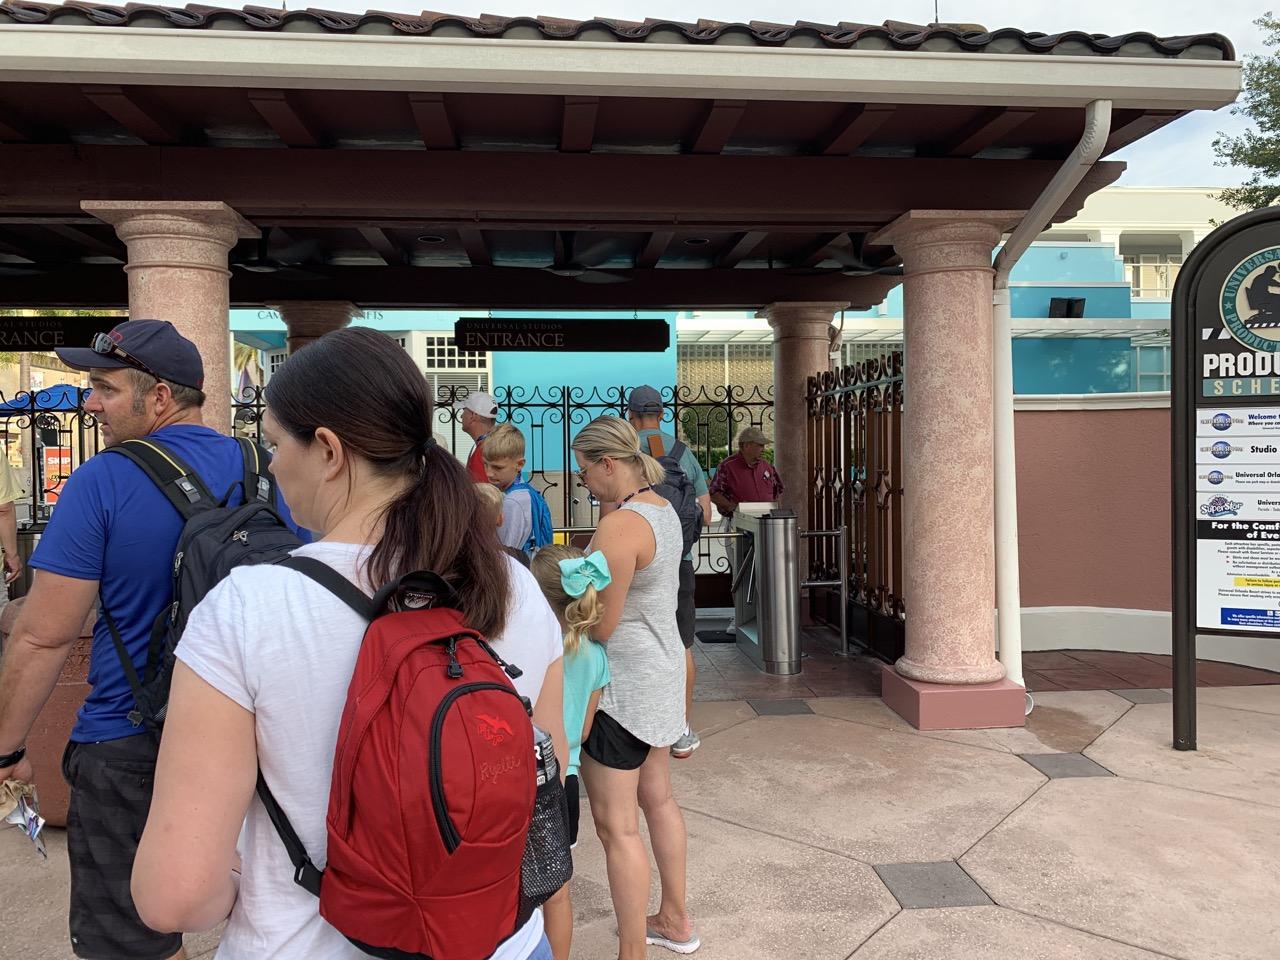 universal orlando summer 2019 trip report part 3 entrance.jpeg